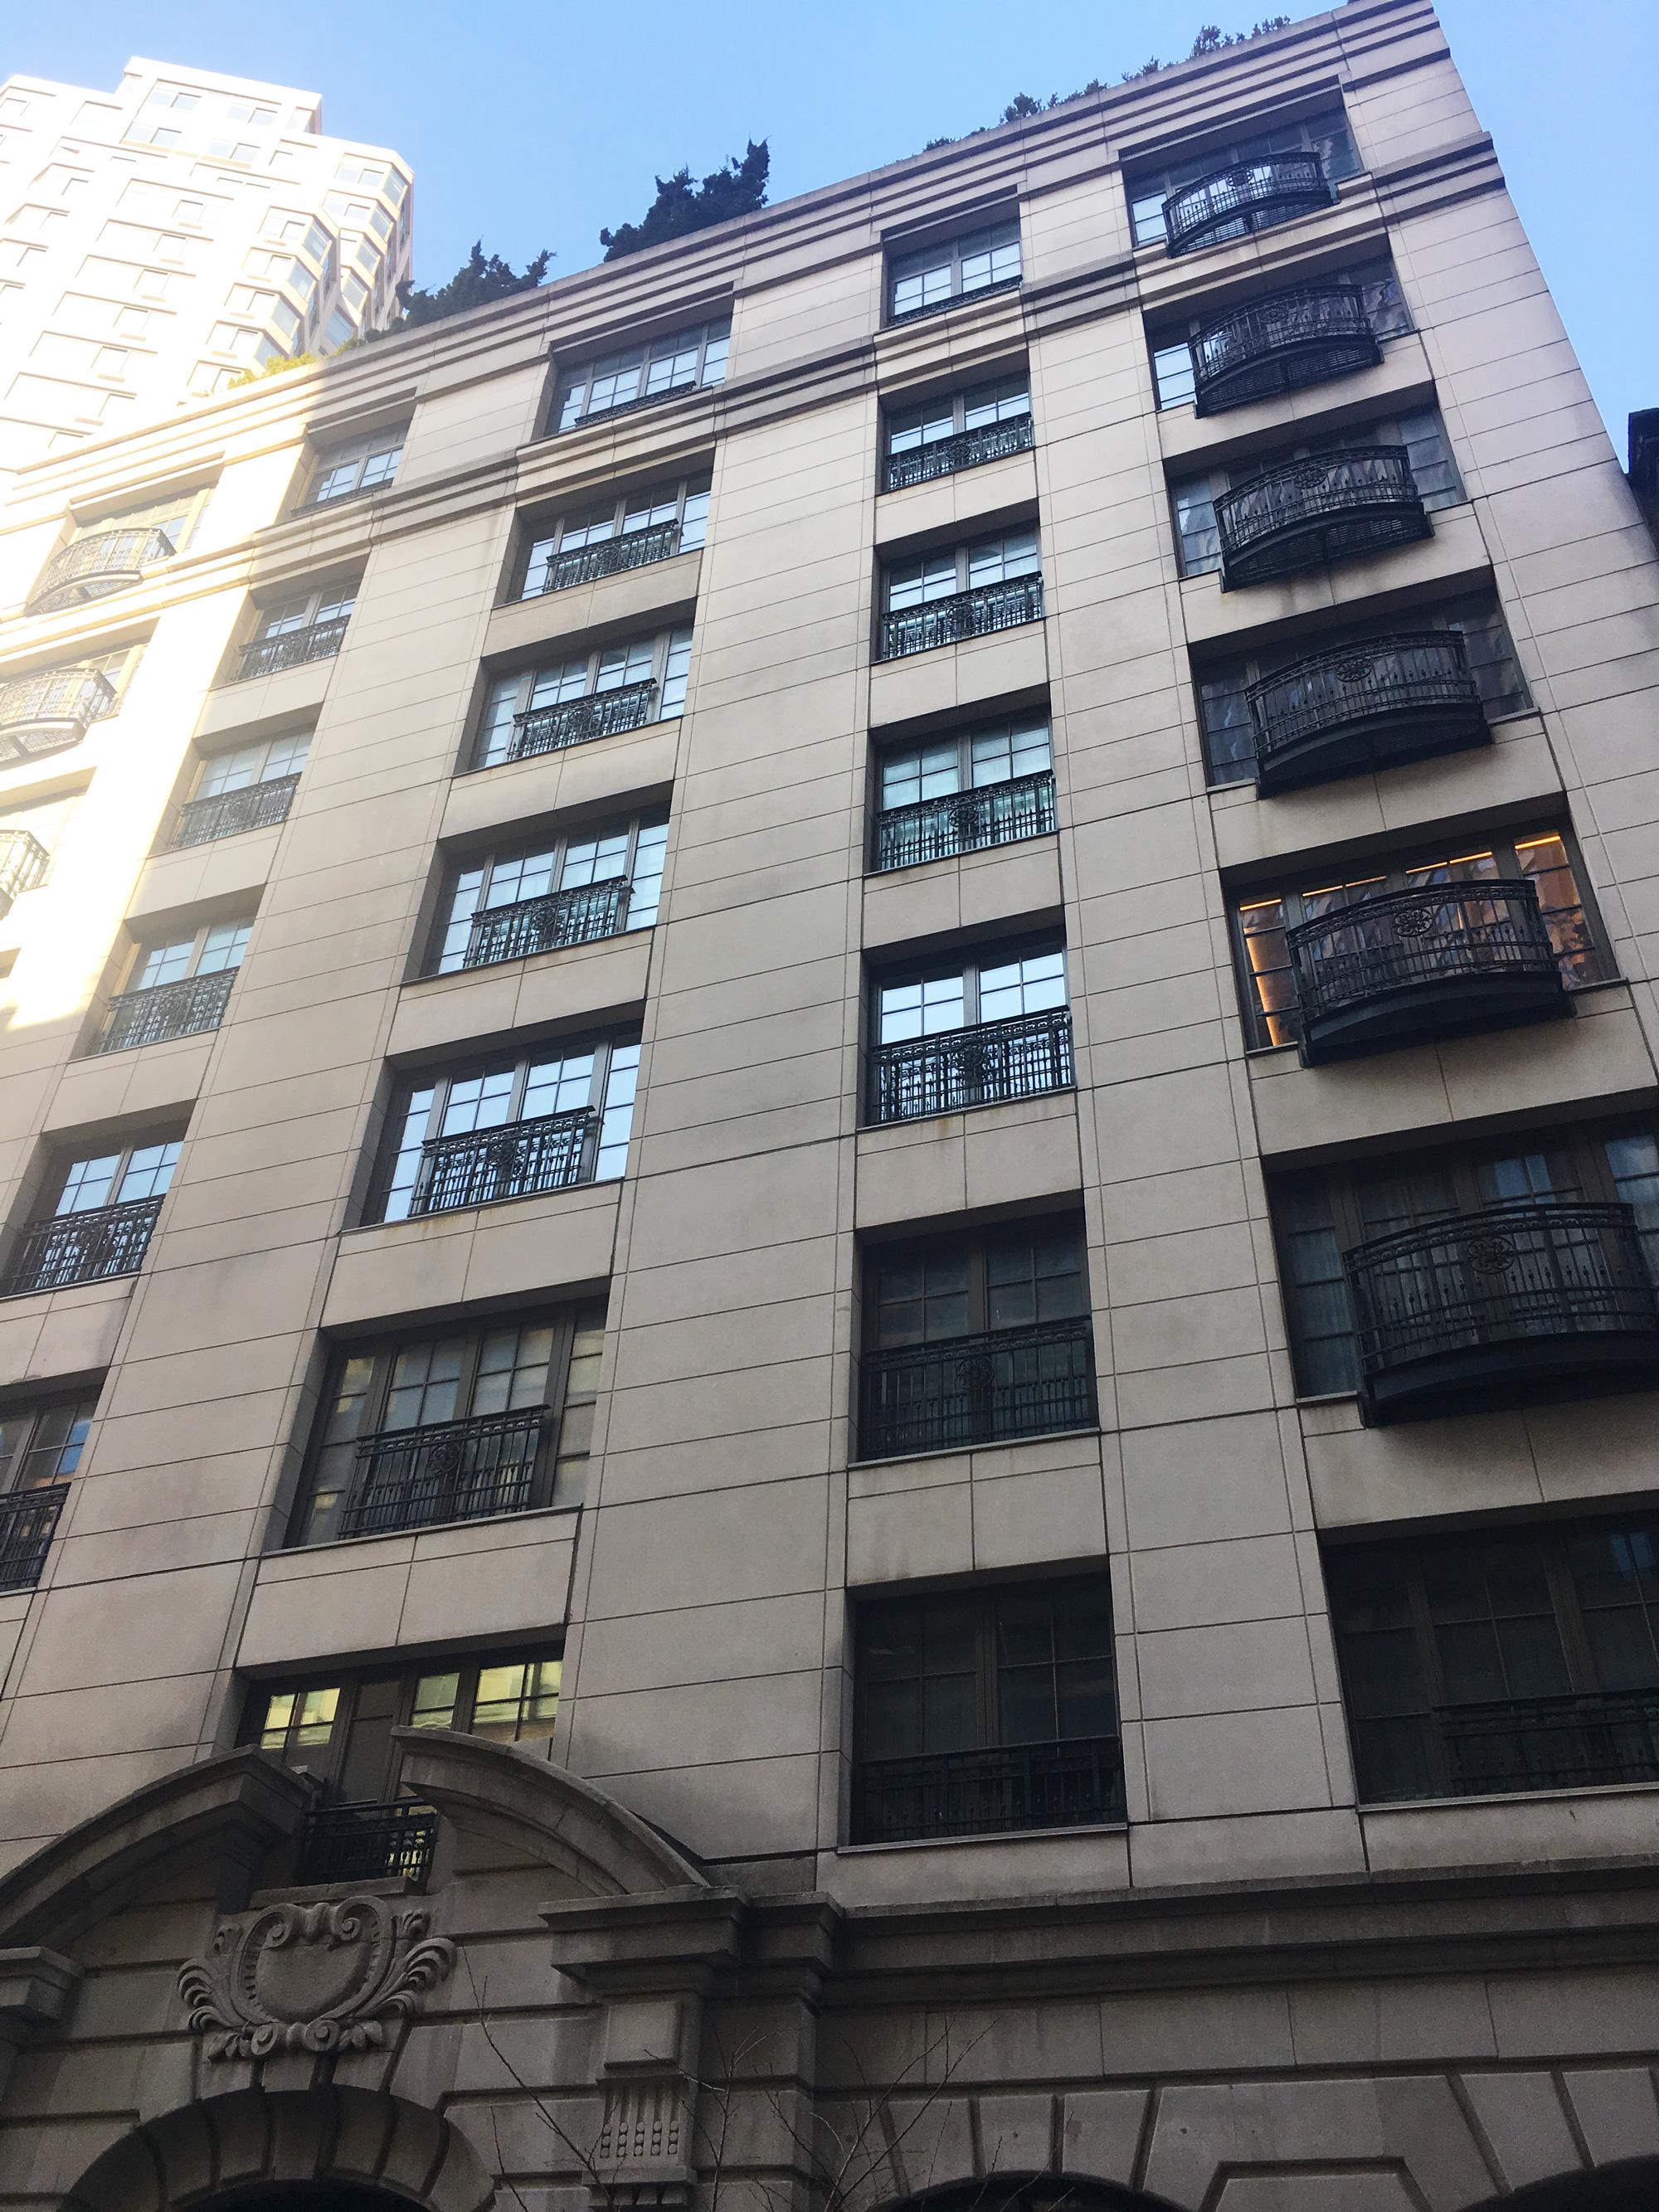 43 West 64th Street, Liberty Lofts